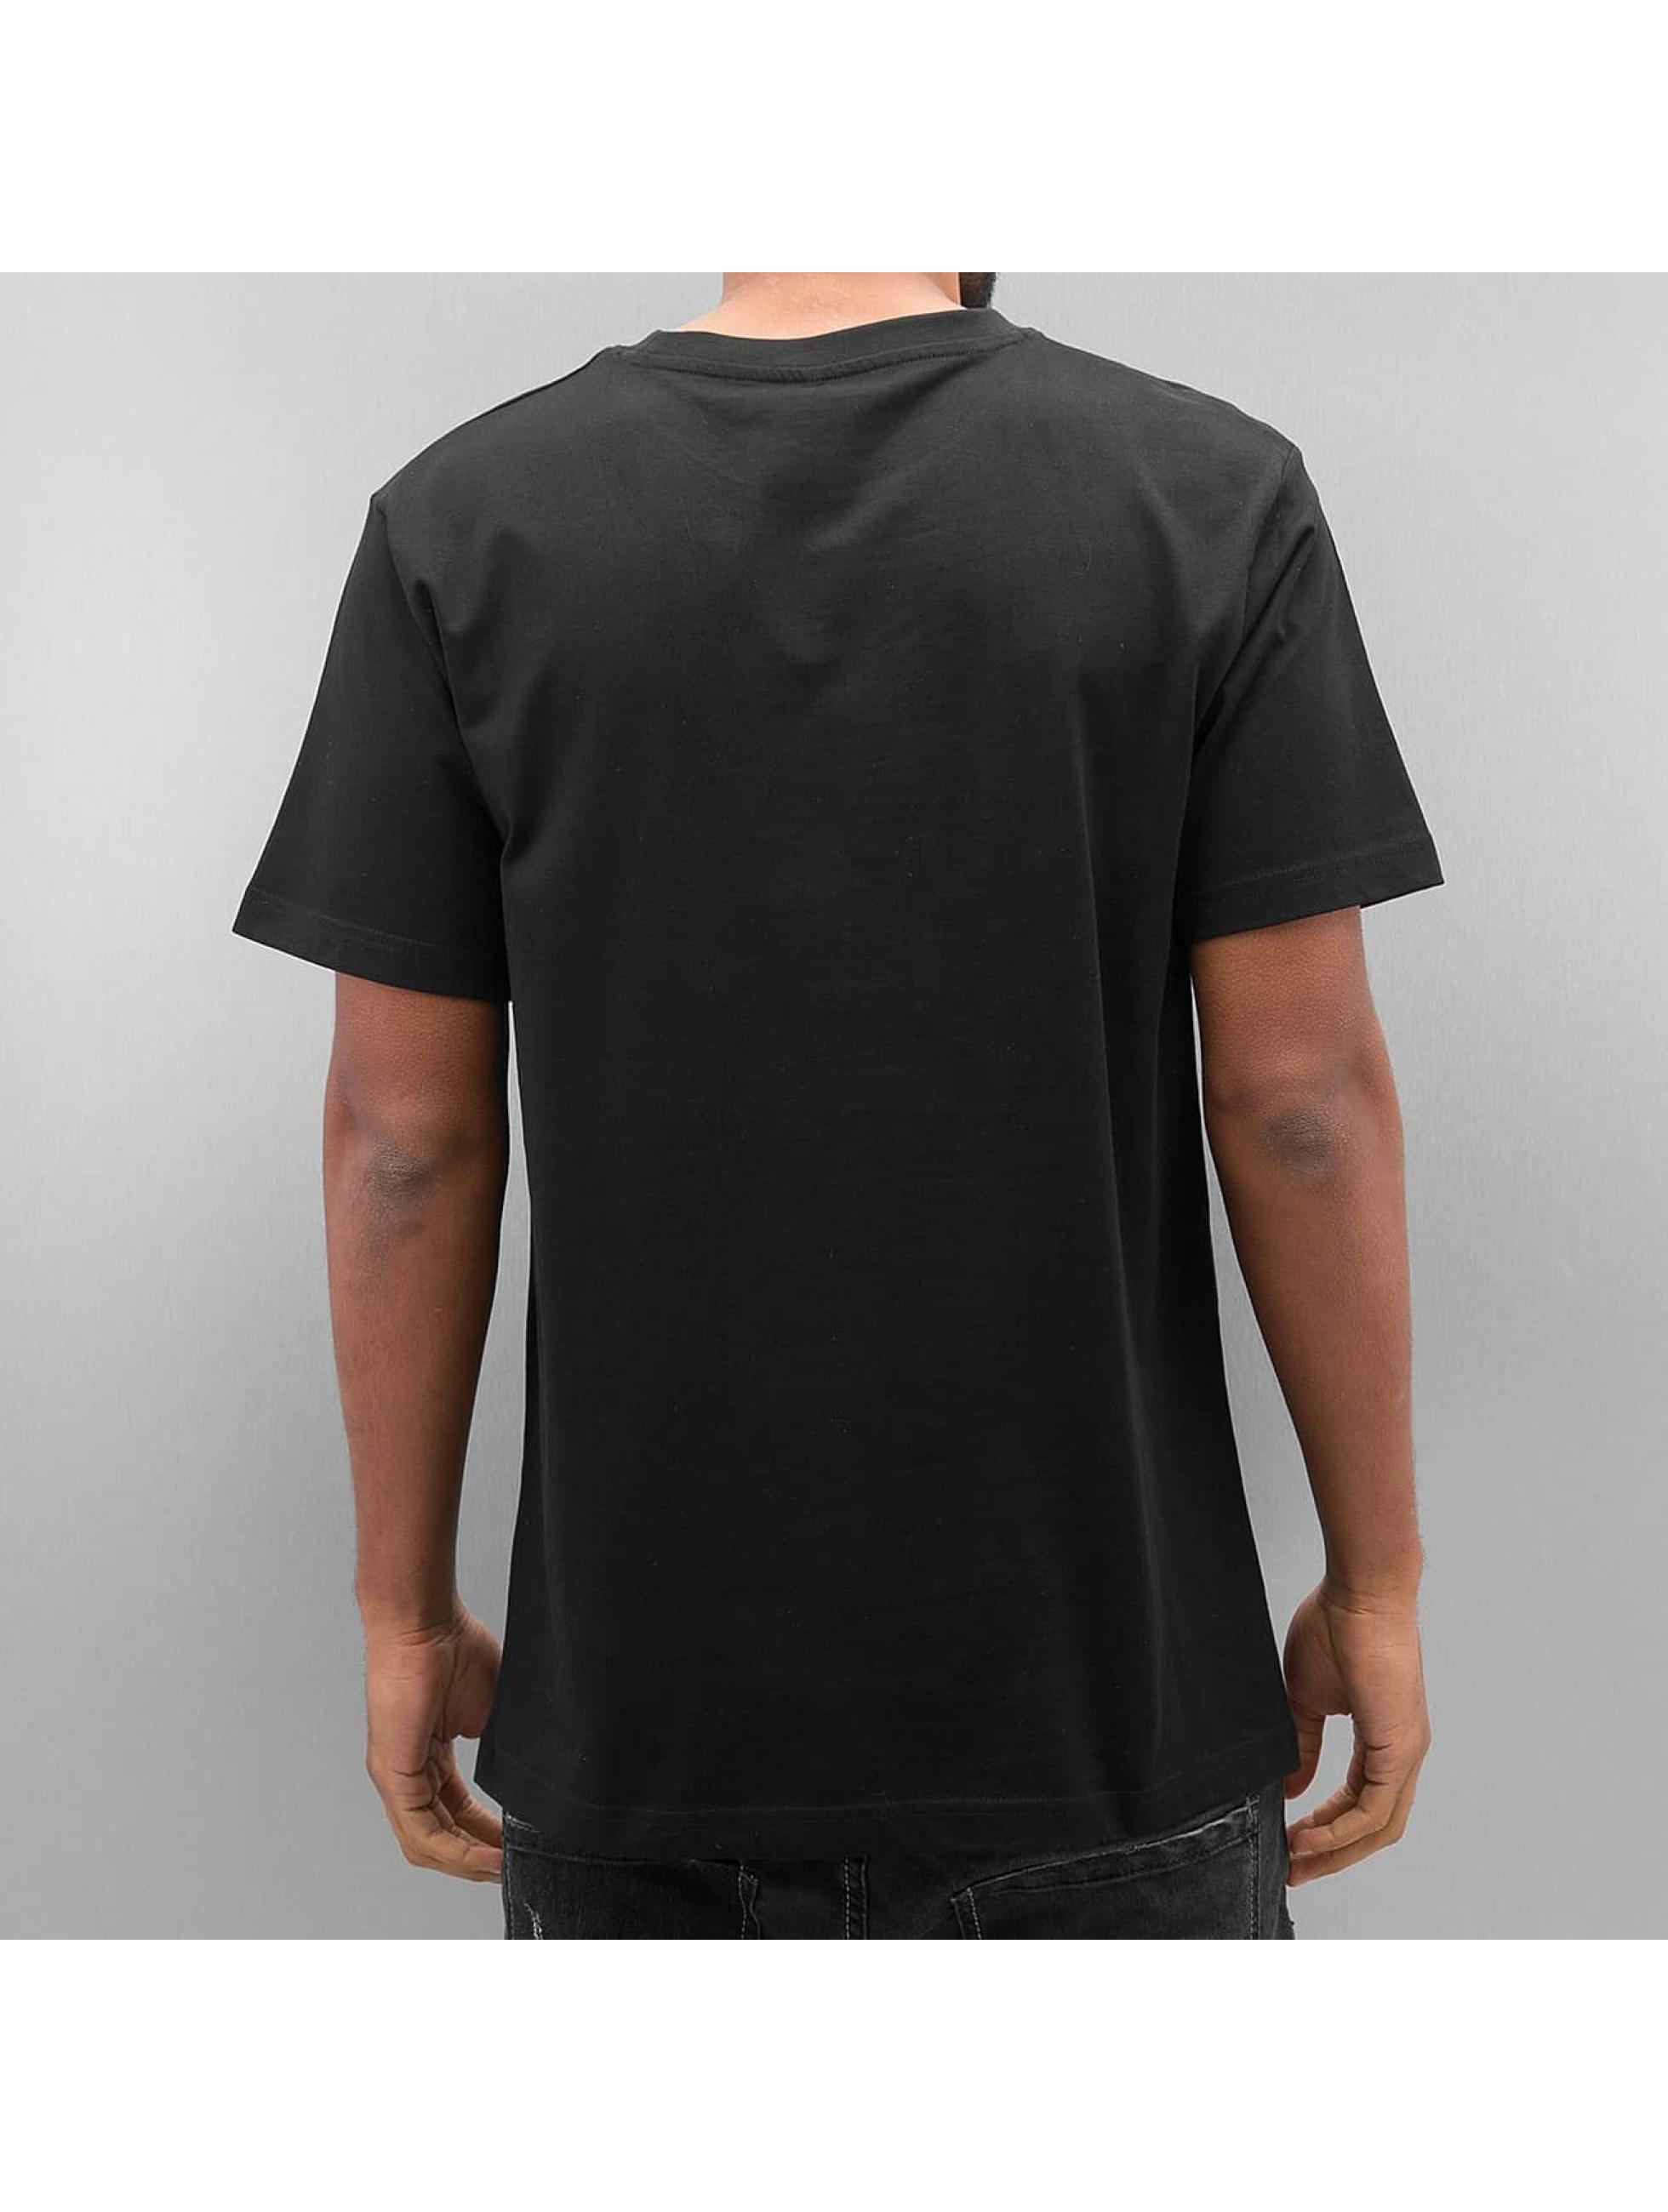 Mister Tee T-Shirt Warcraft Horde schwarz